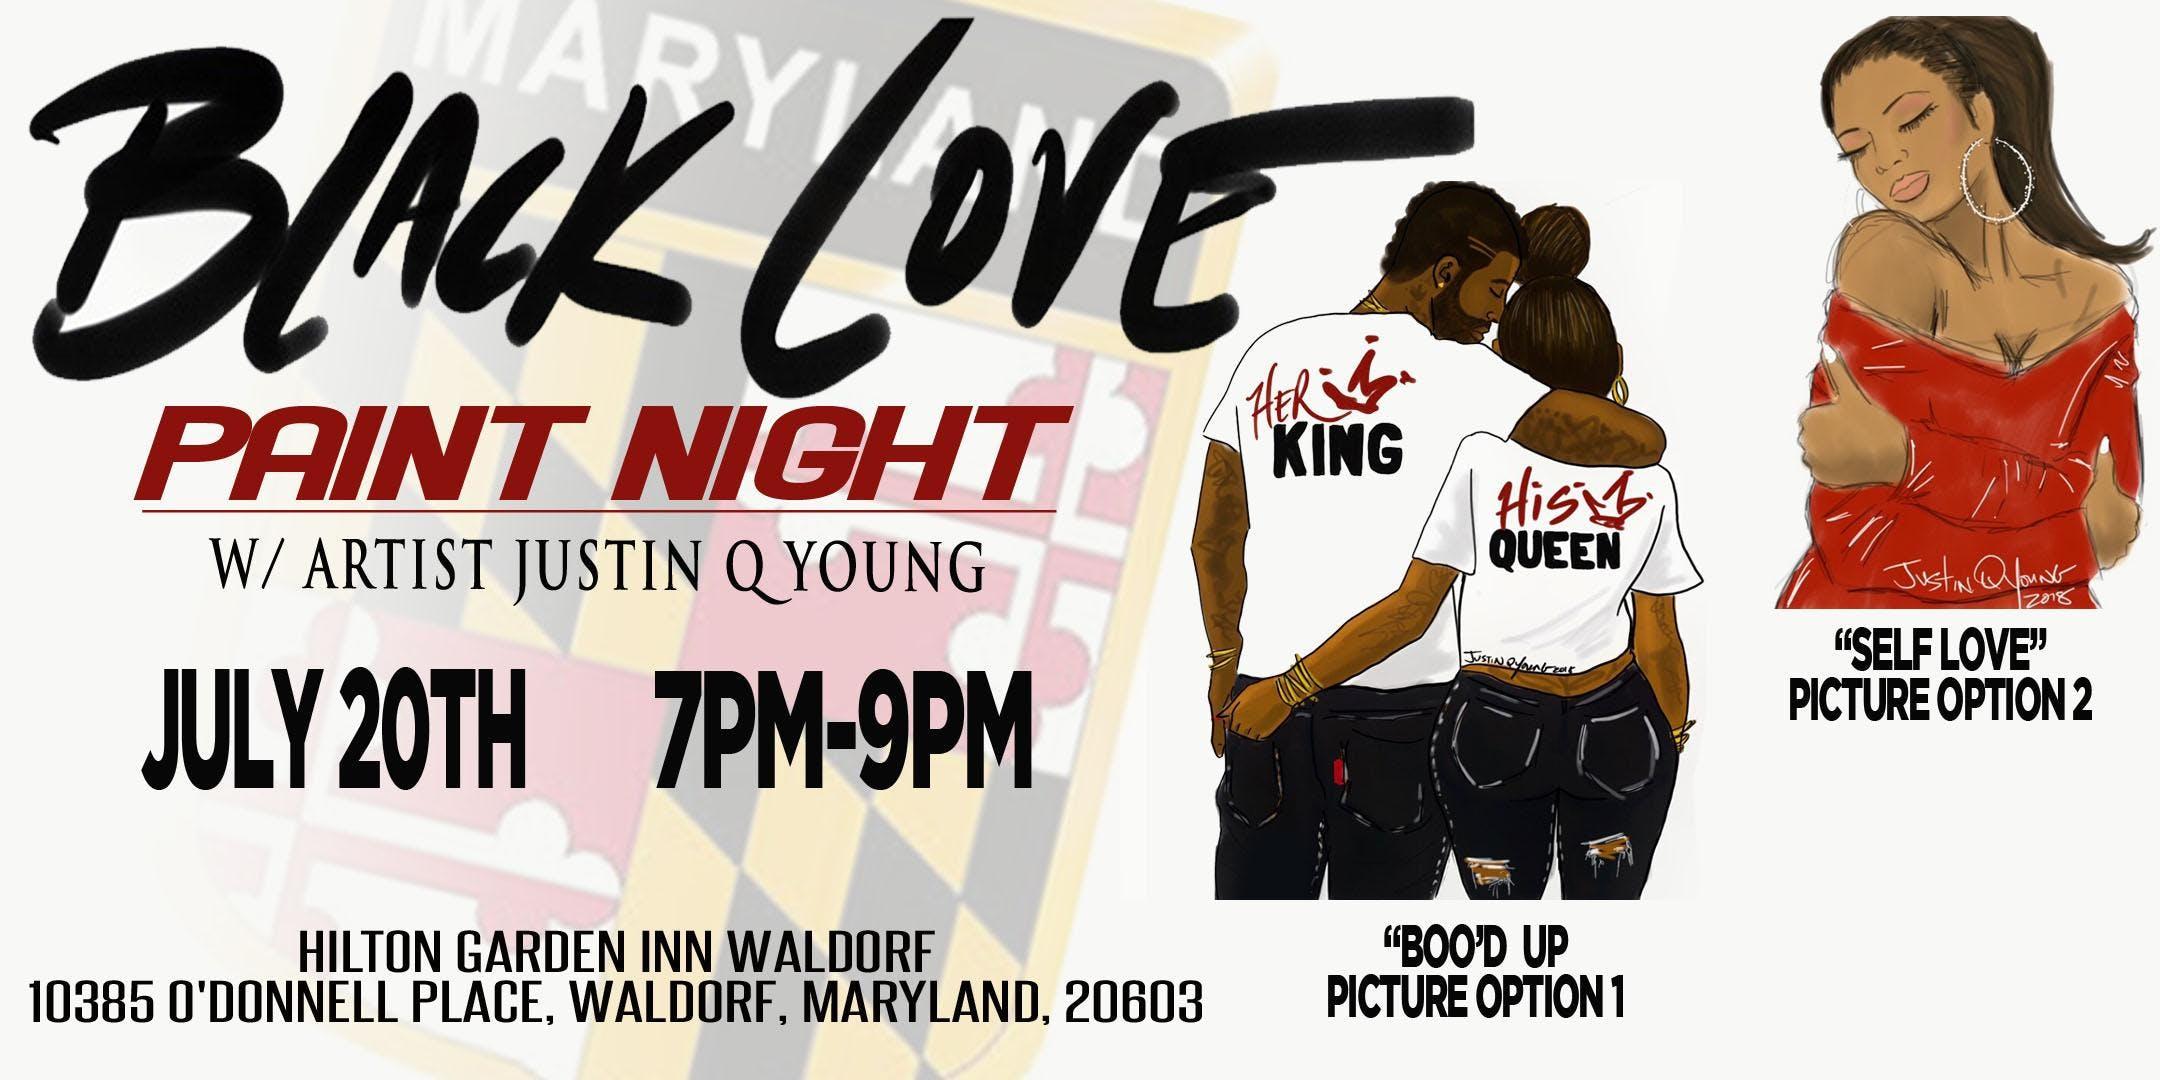 black love paint night - Hilton Garden Inn Waldorf